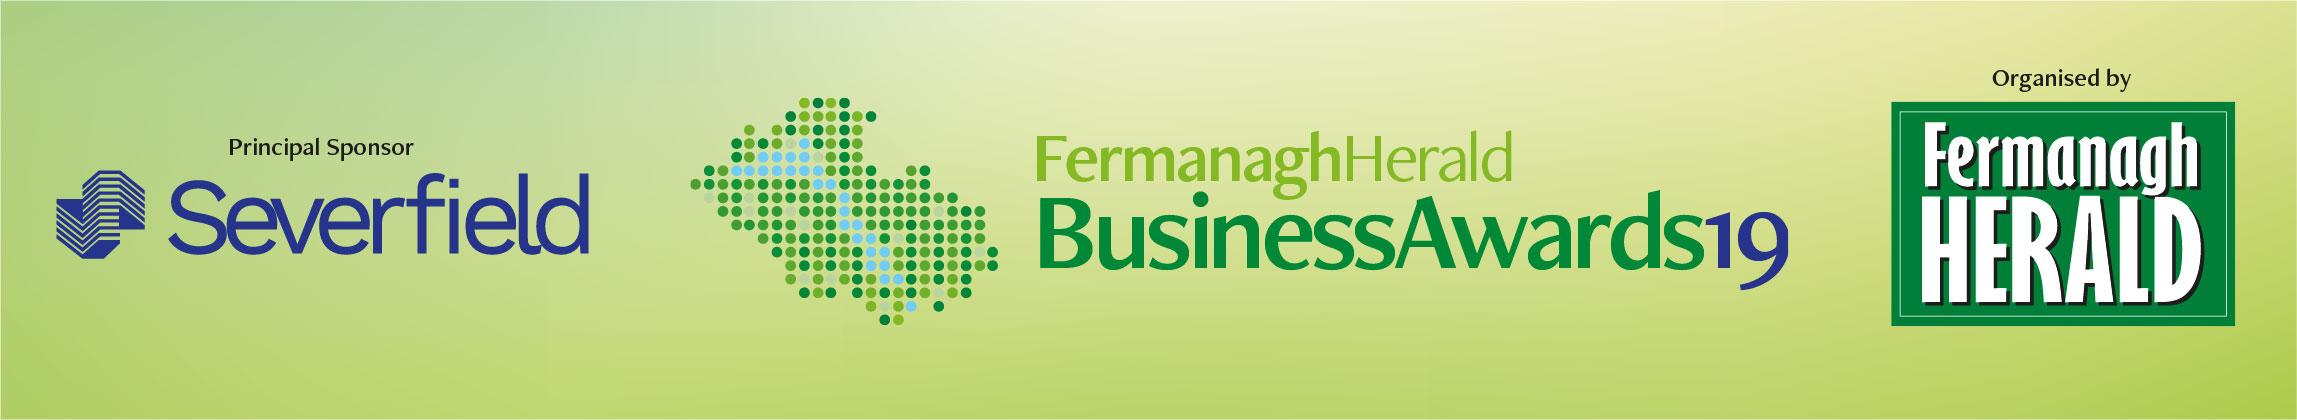 Fermanagh Herald Business Awards Header